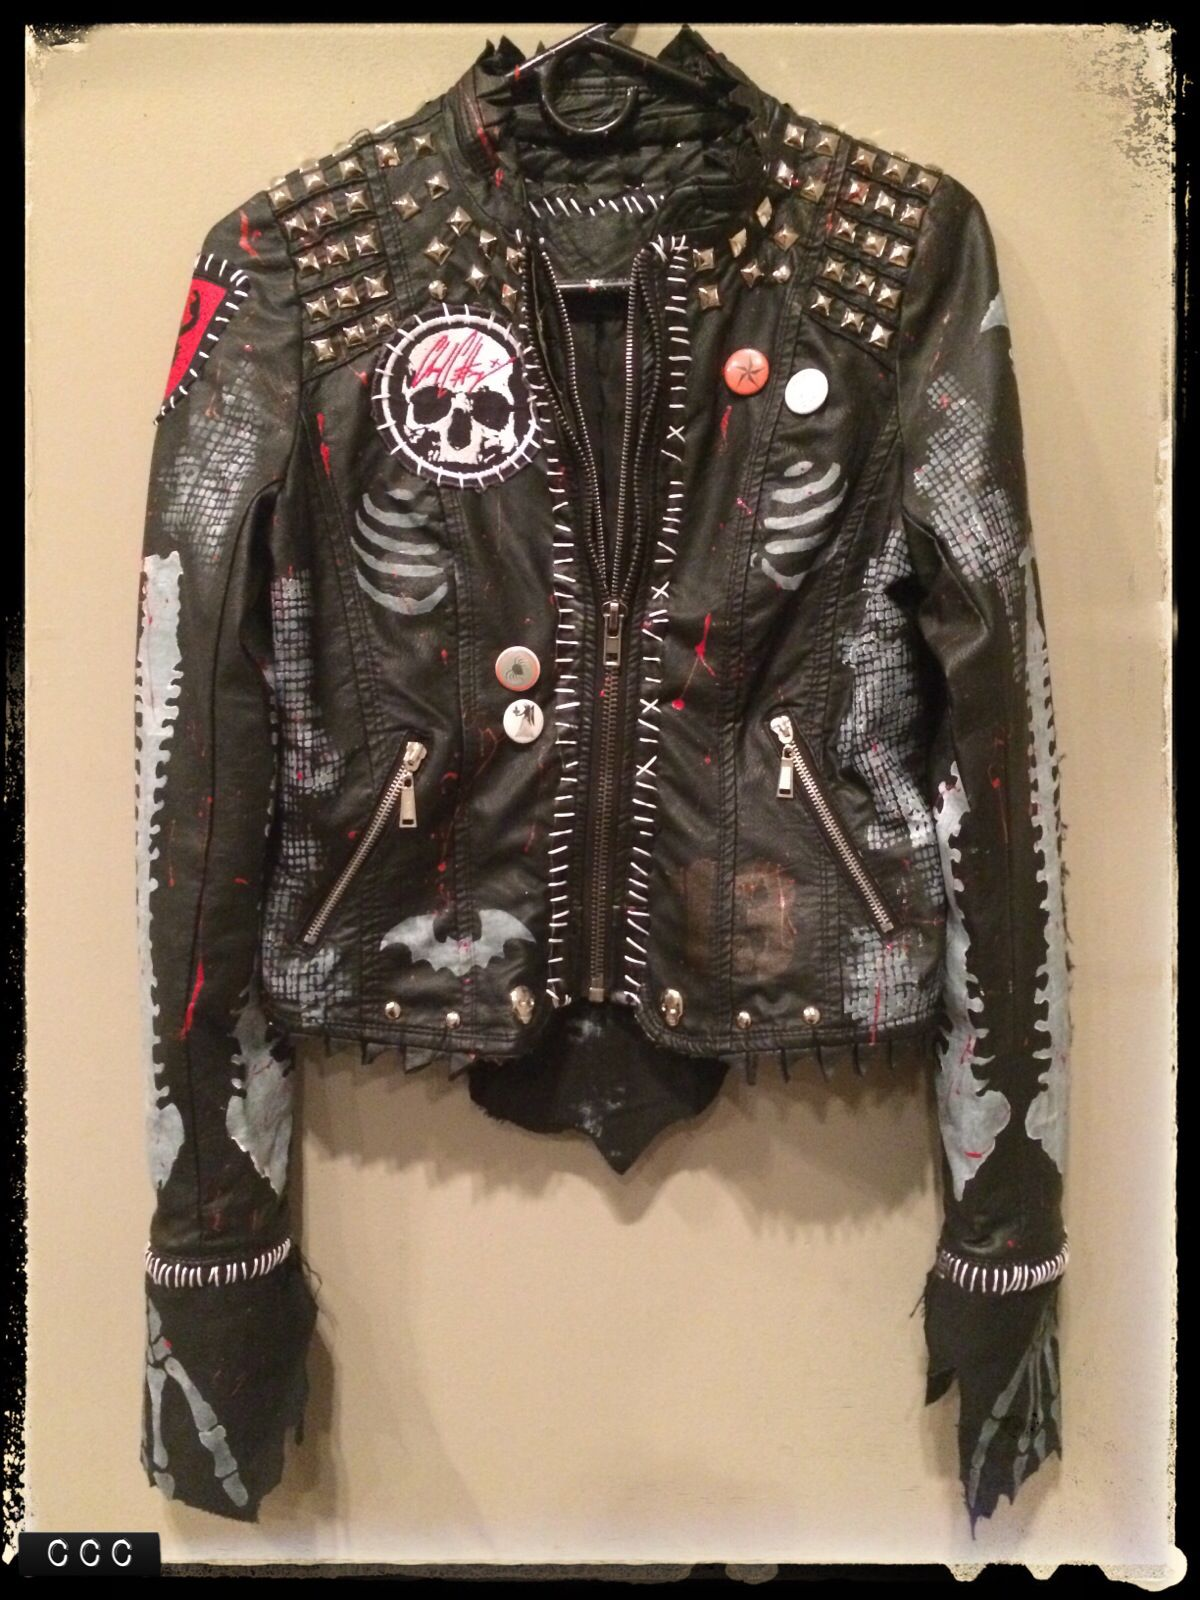 Rock leather jackets